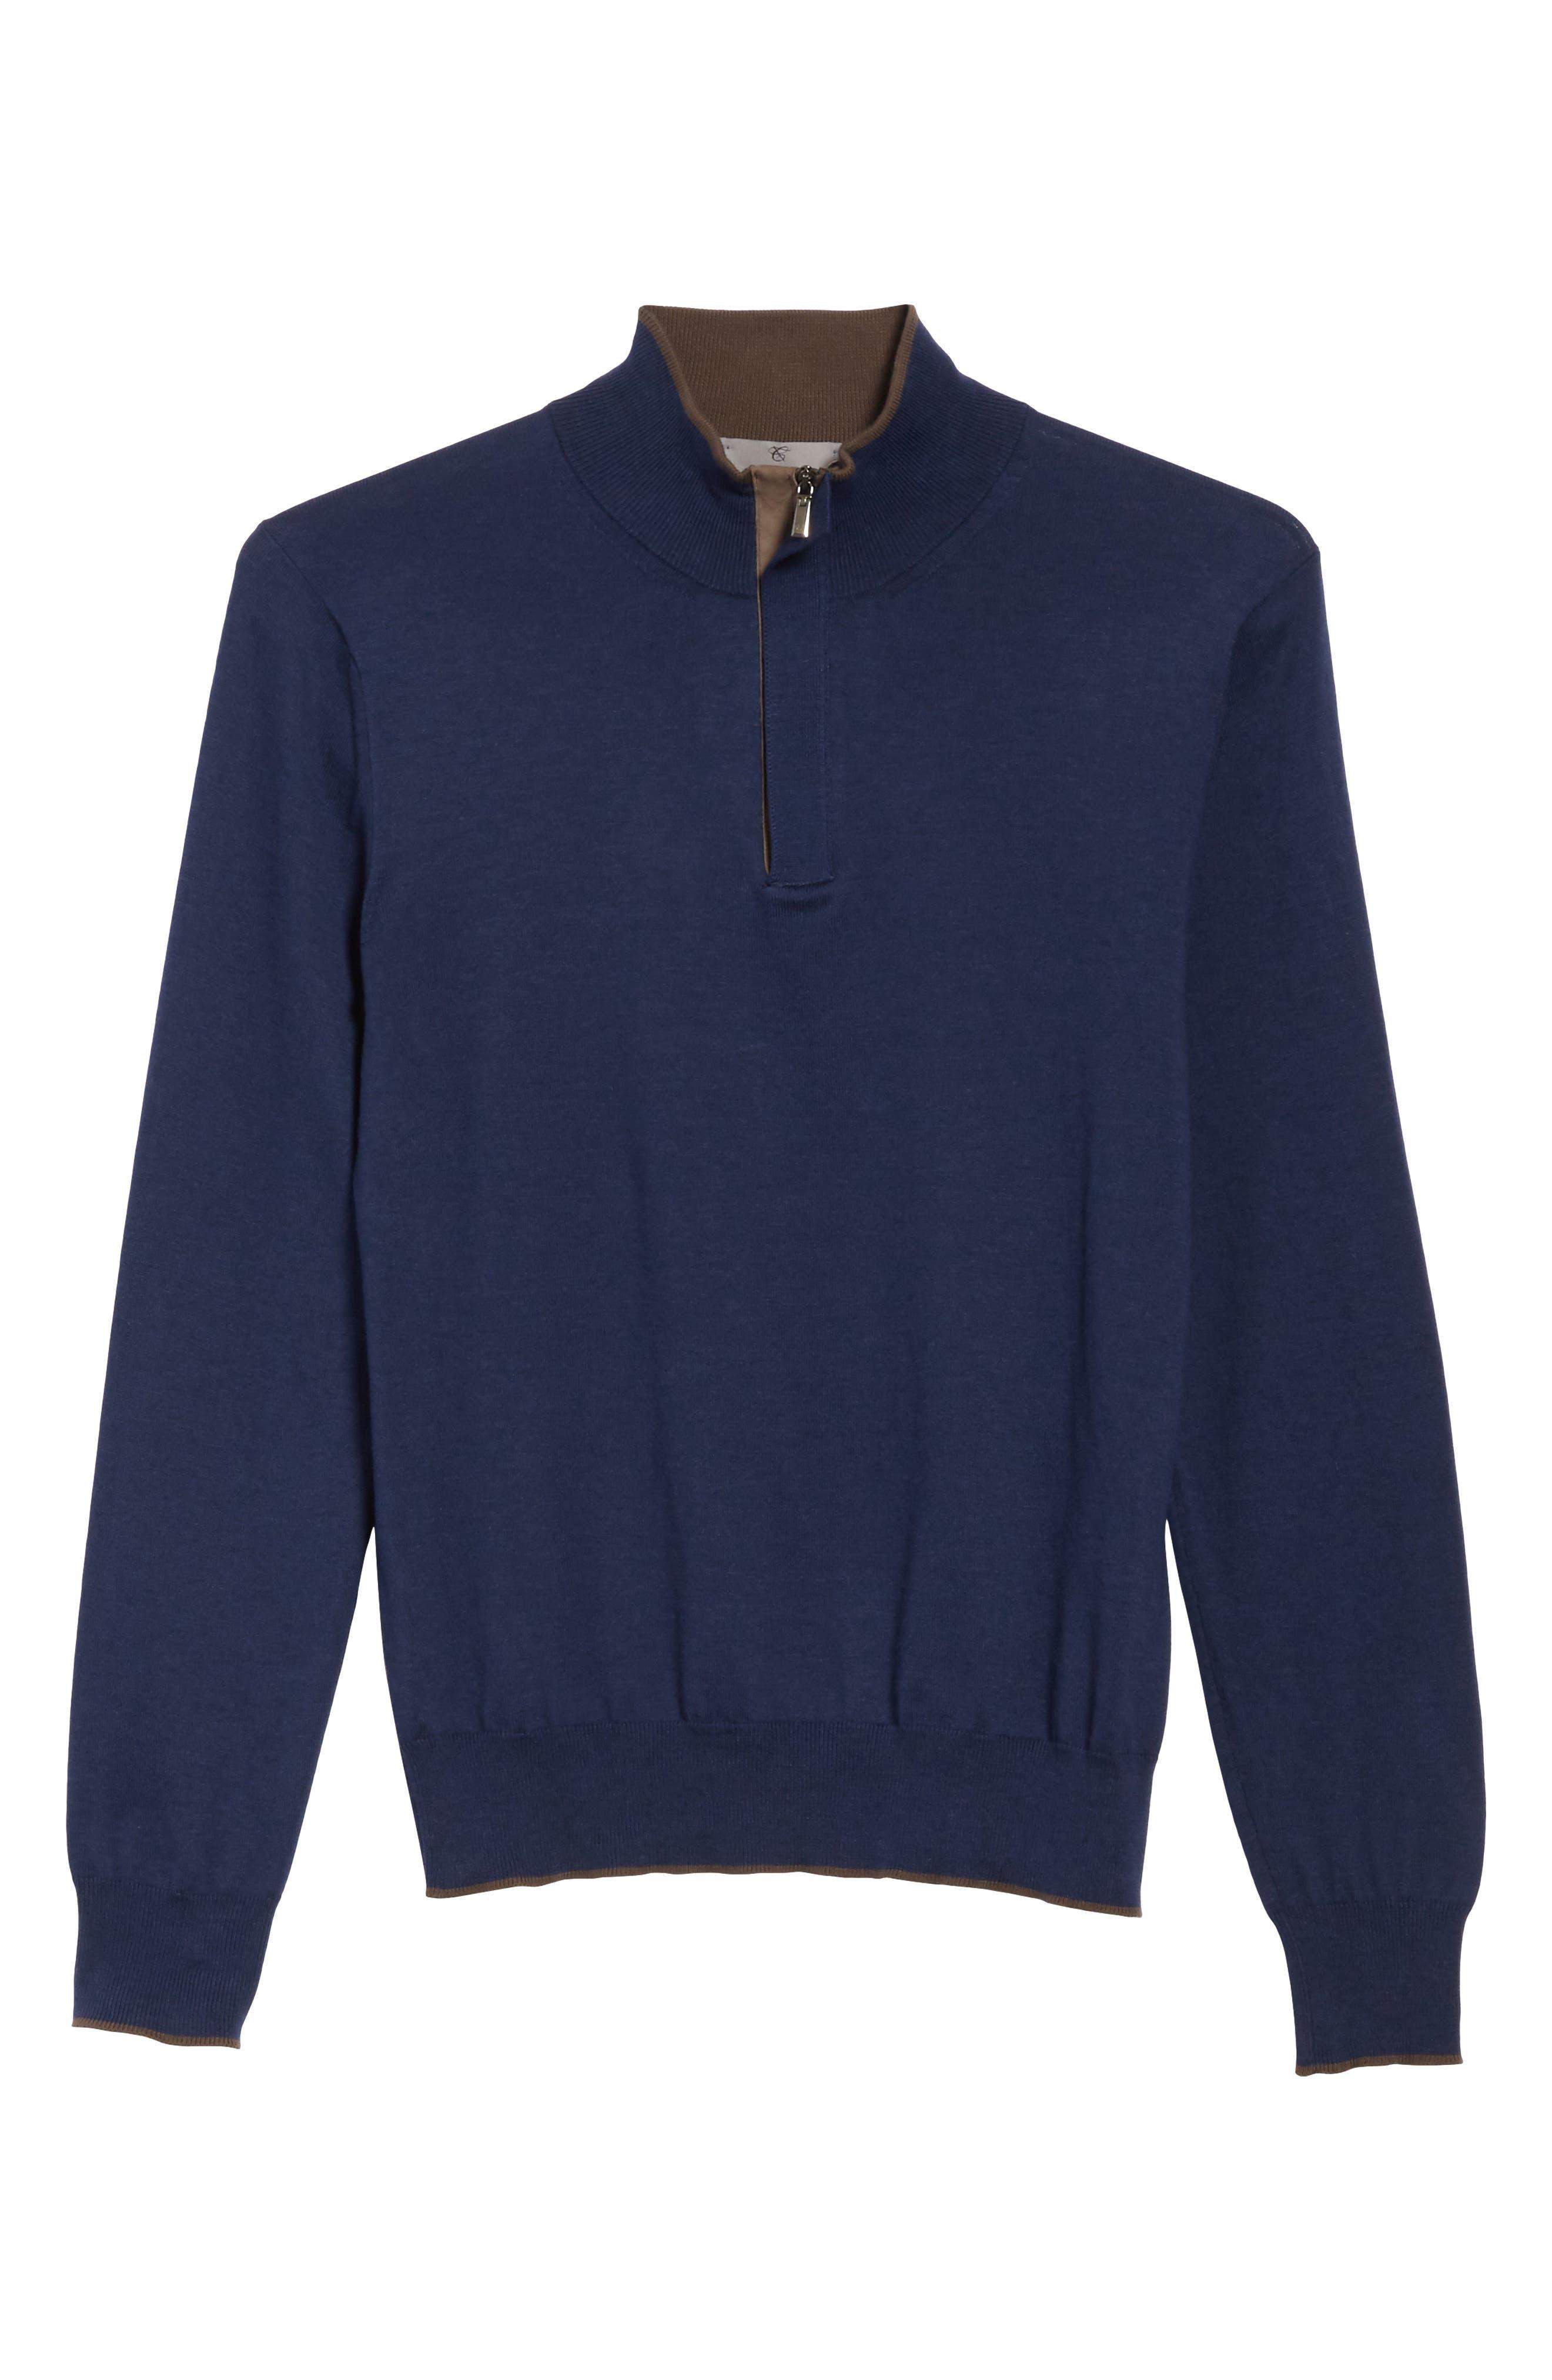 Quarter Zip Sweater,                             Alternate thumbnail 6, color,                             401